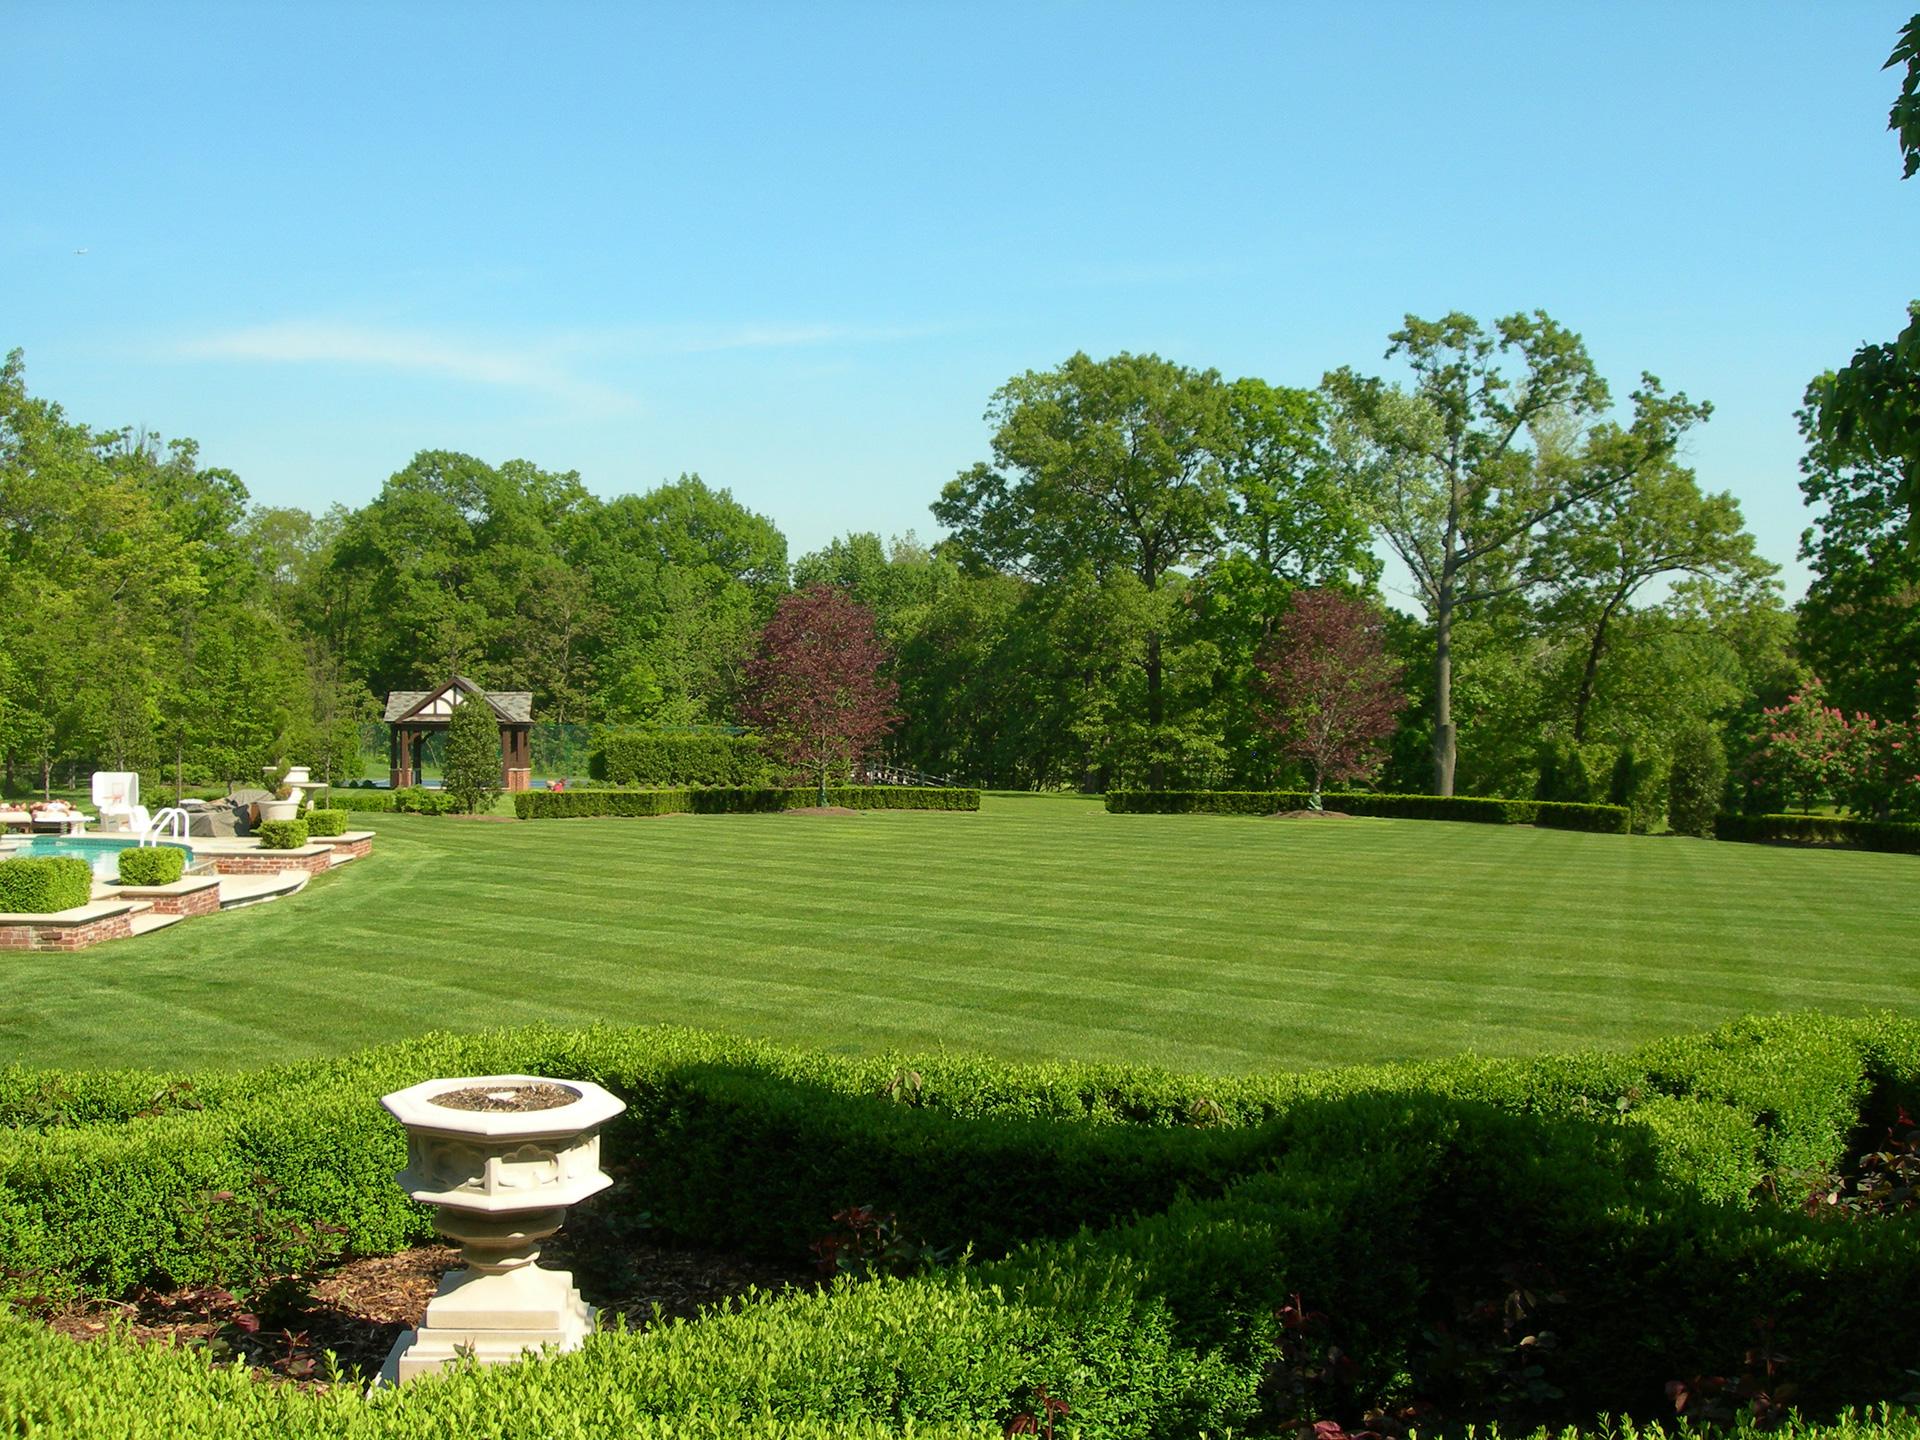 Forcellati Bros. Inc. | Landscaping Design Garden Center and Nursery